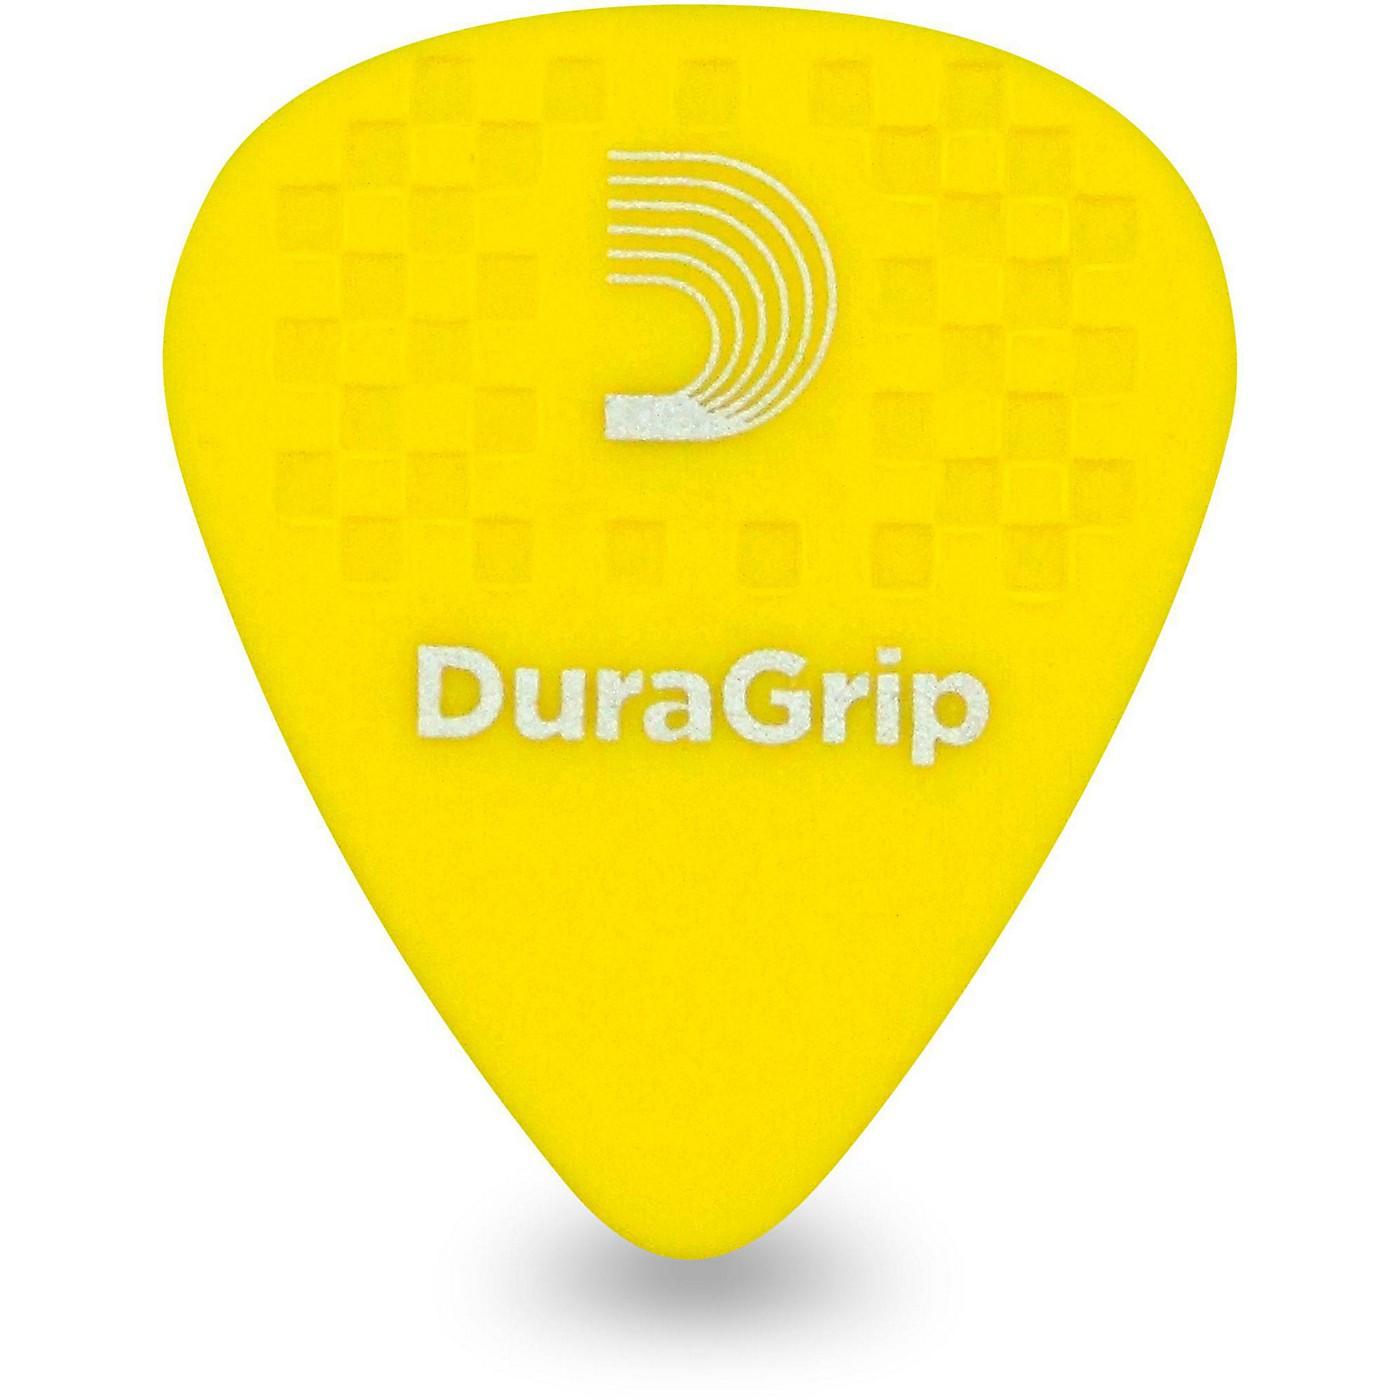 D'Addario Planet Waves DuraGrip, Light/Medium by D'Addario thumbnail